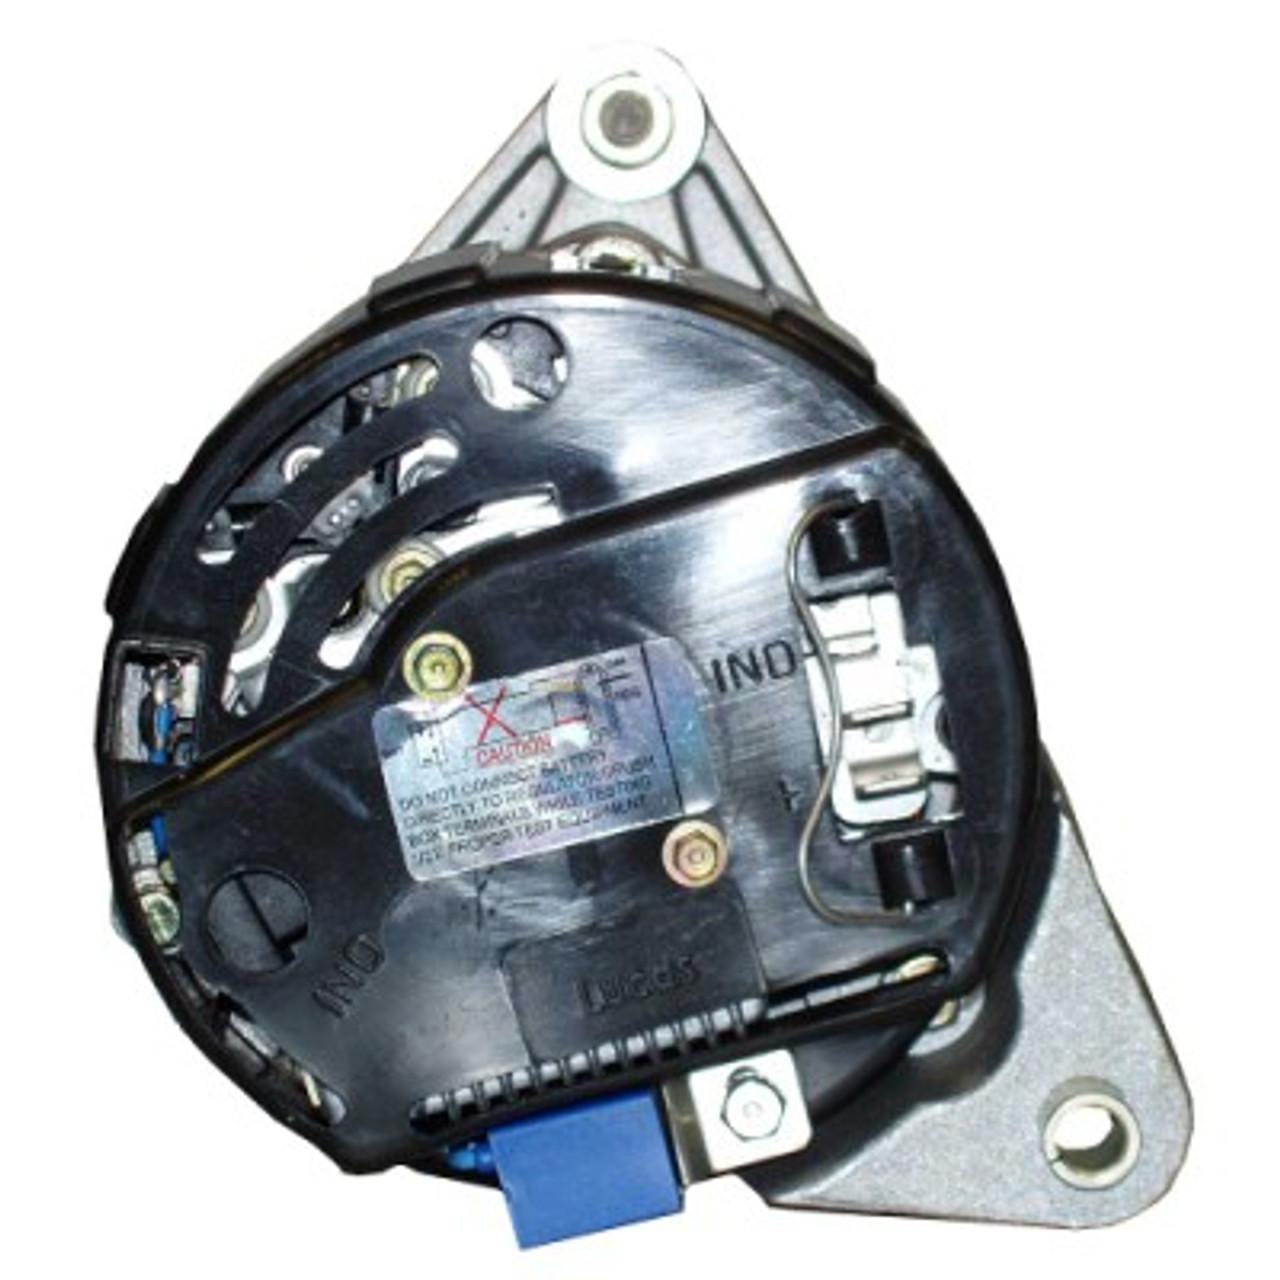 Perkins 200 series 12v 45 Amp Alternator from parts4engines.com